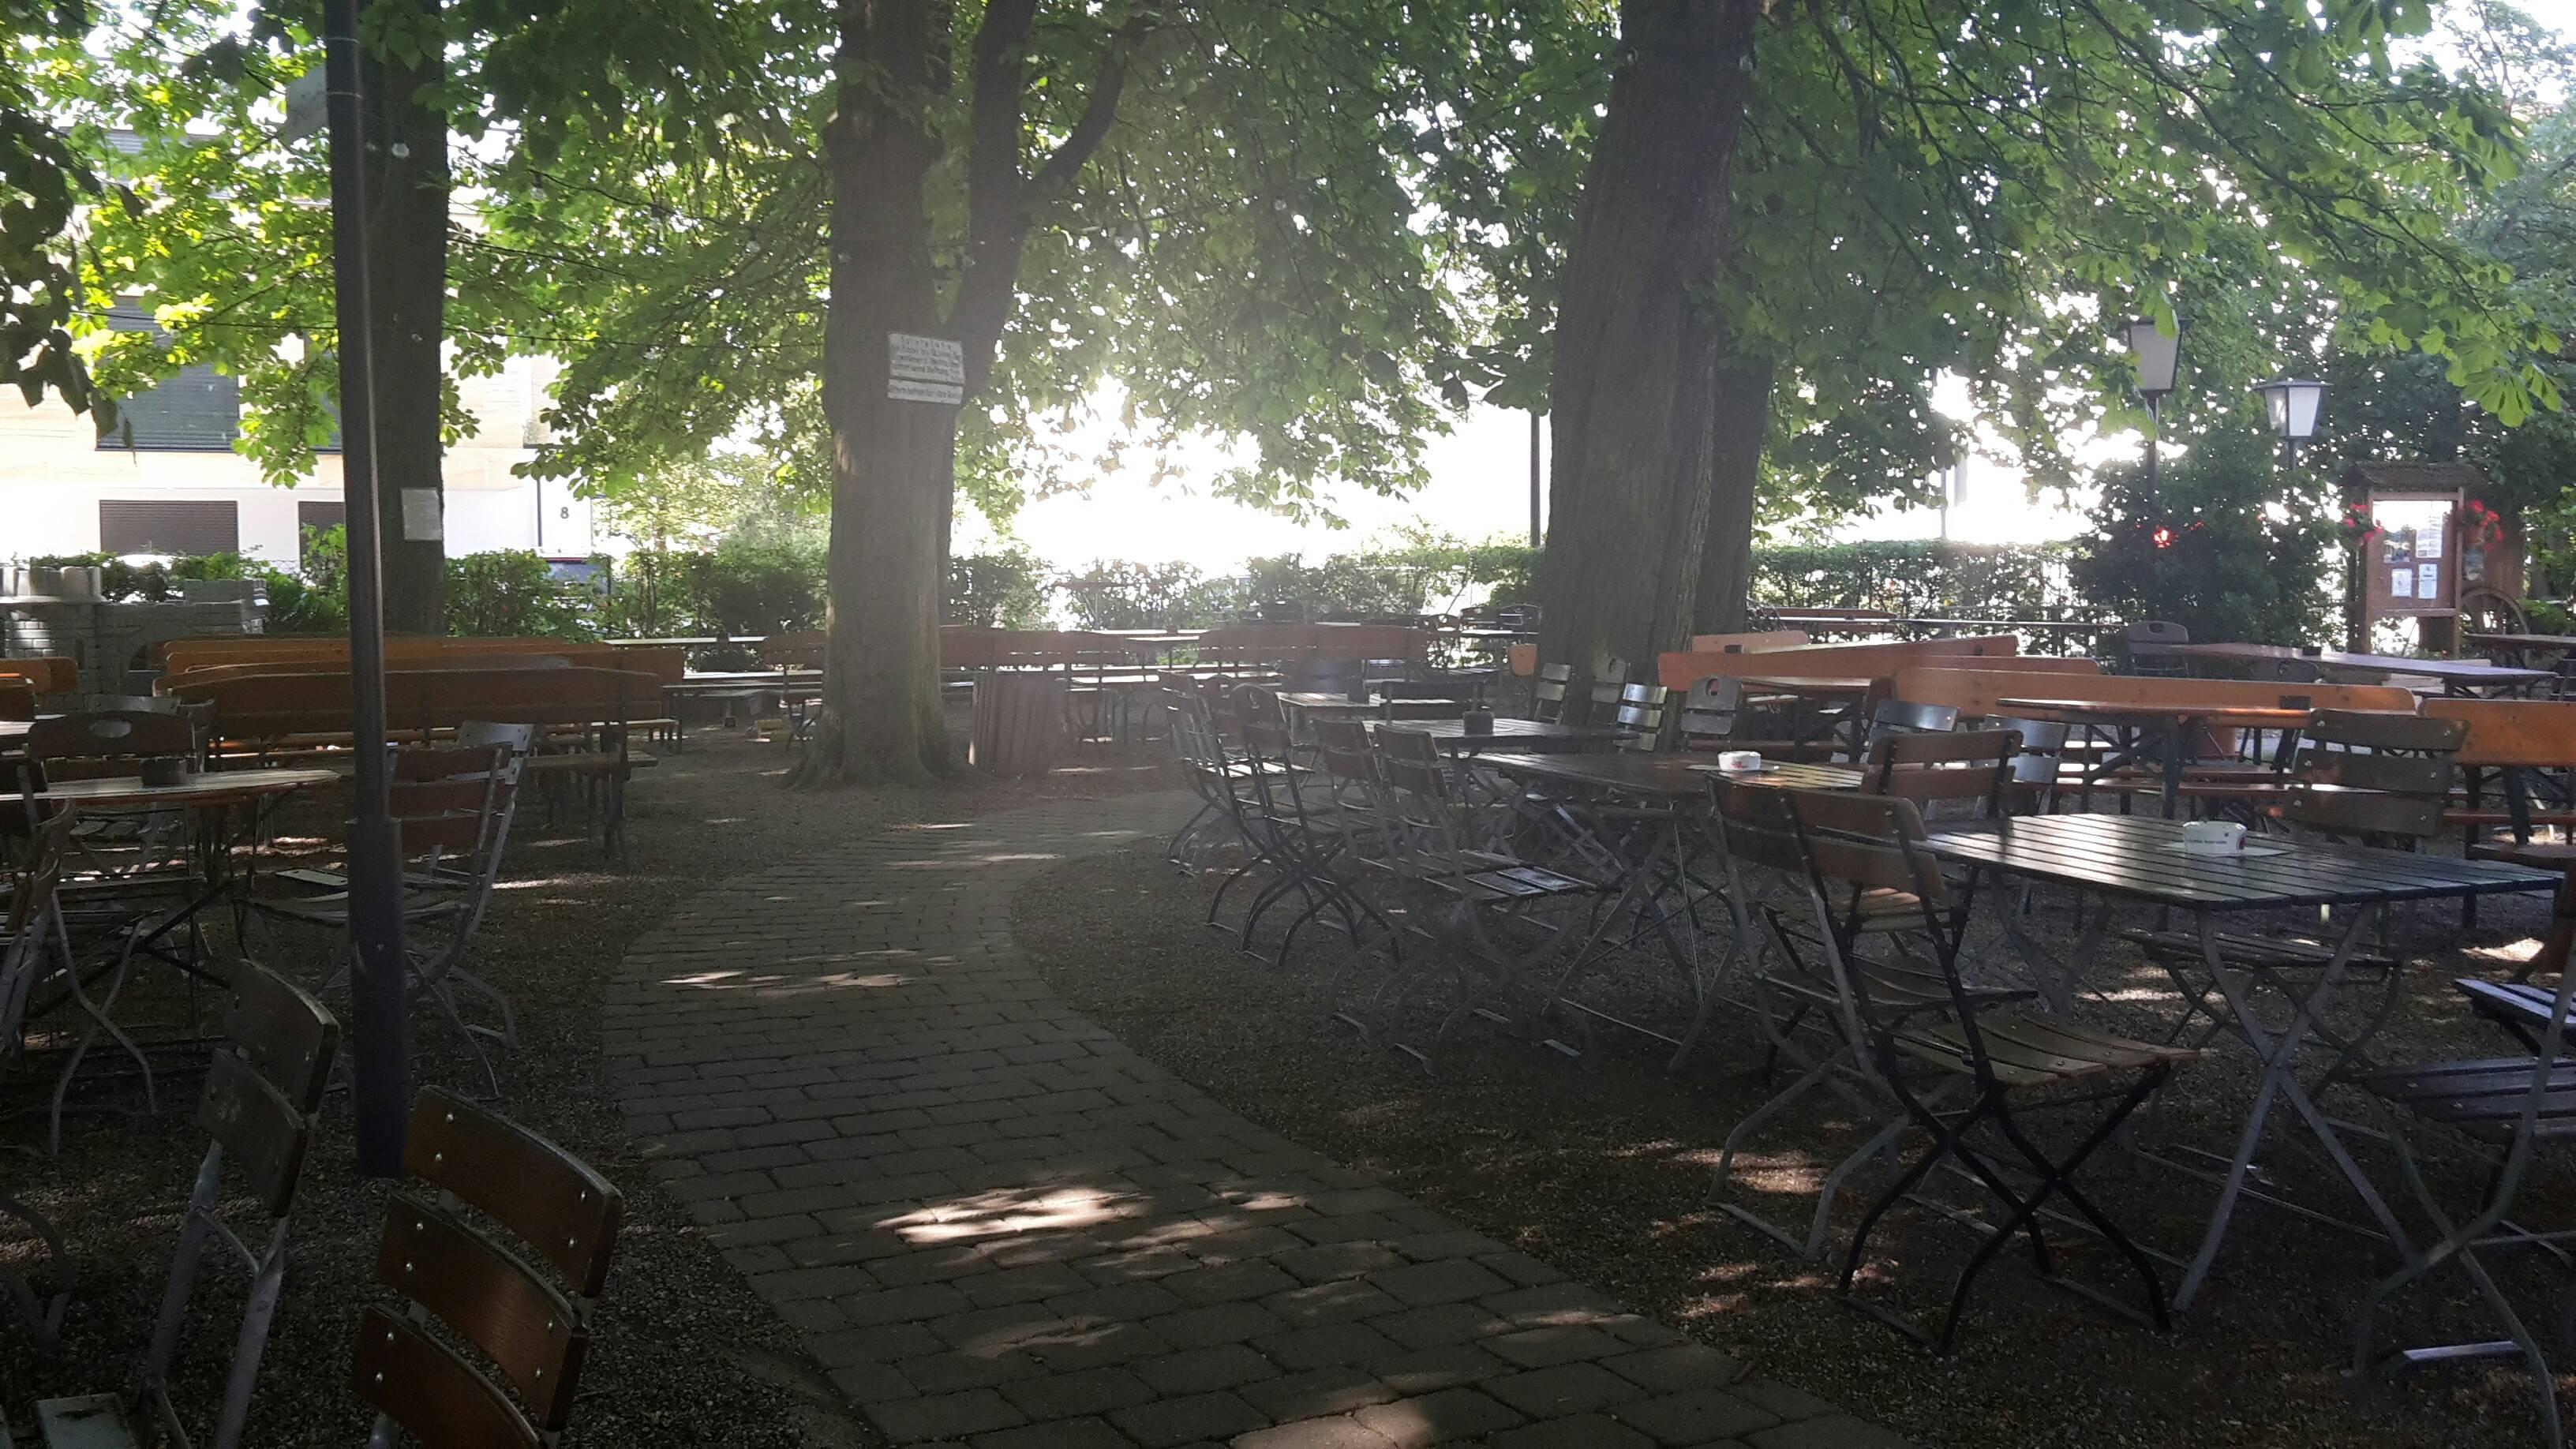 Schlossle Brauerei 89231 Neu Ulm Offenhausen Offnungszeiten Adresse Telefon